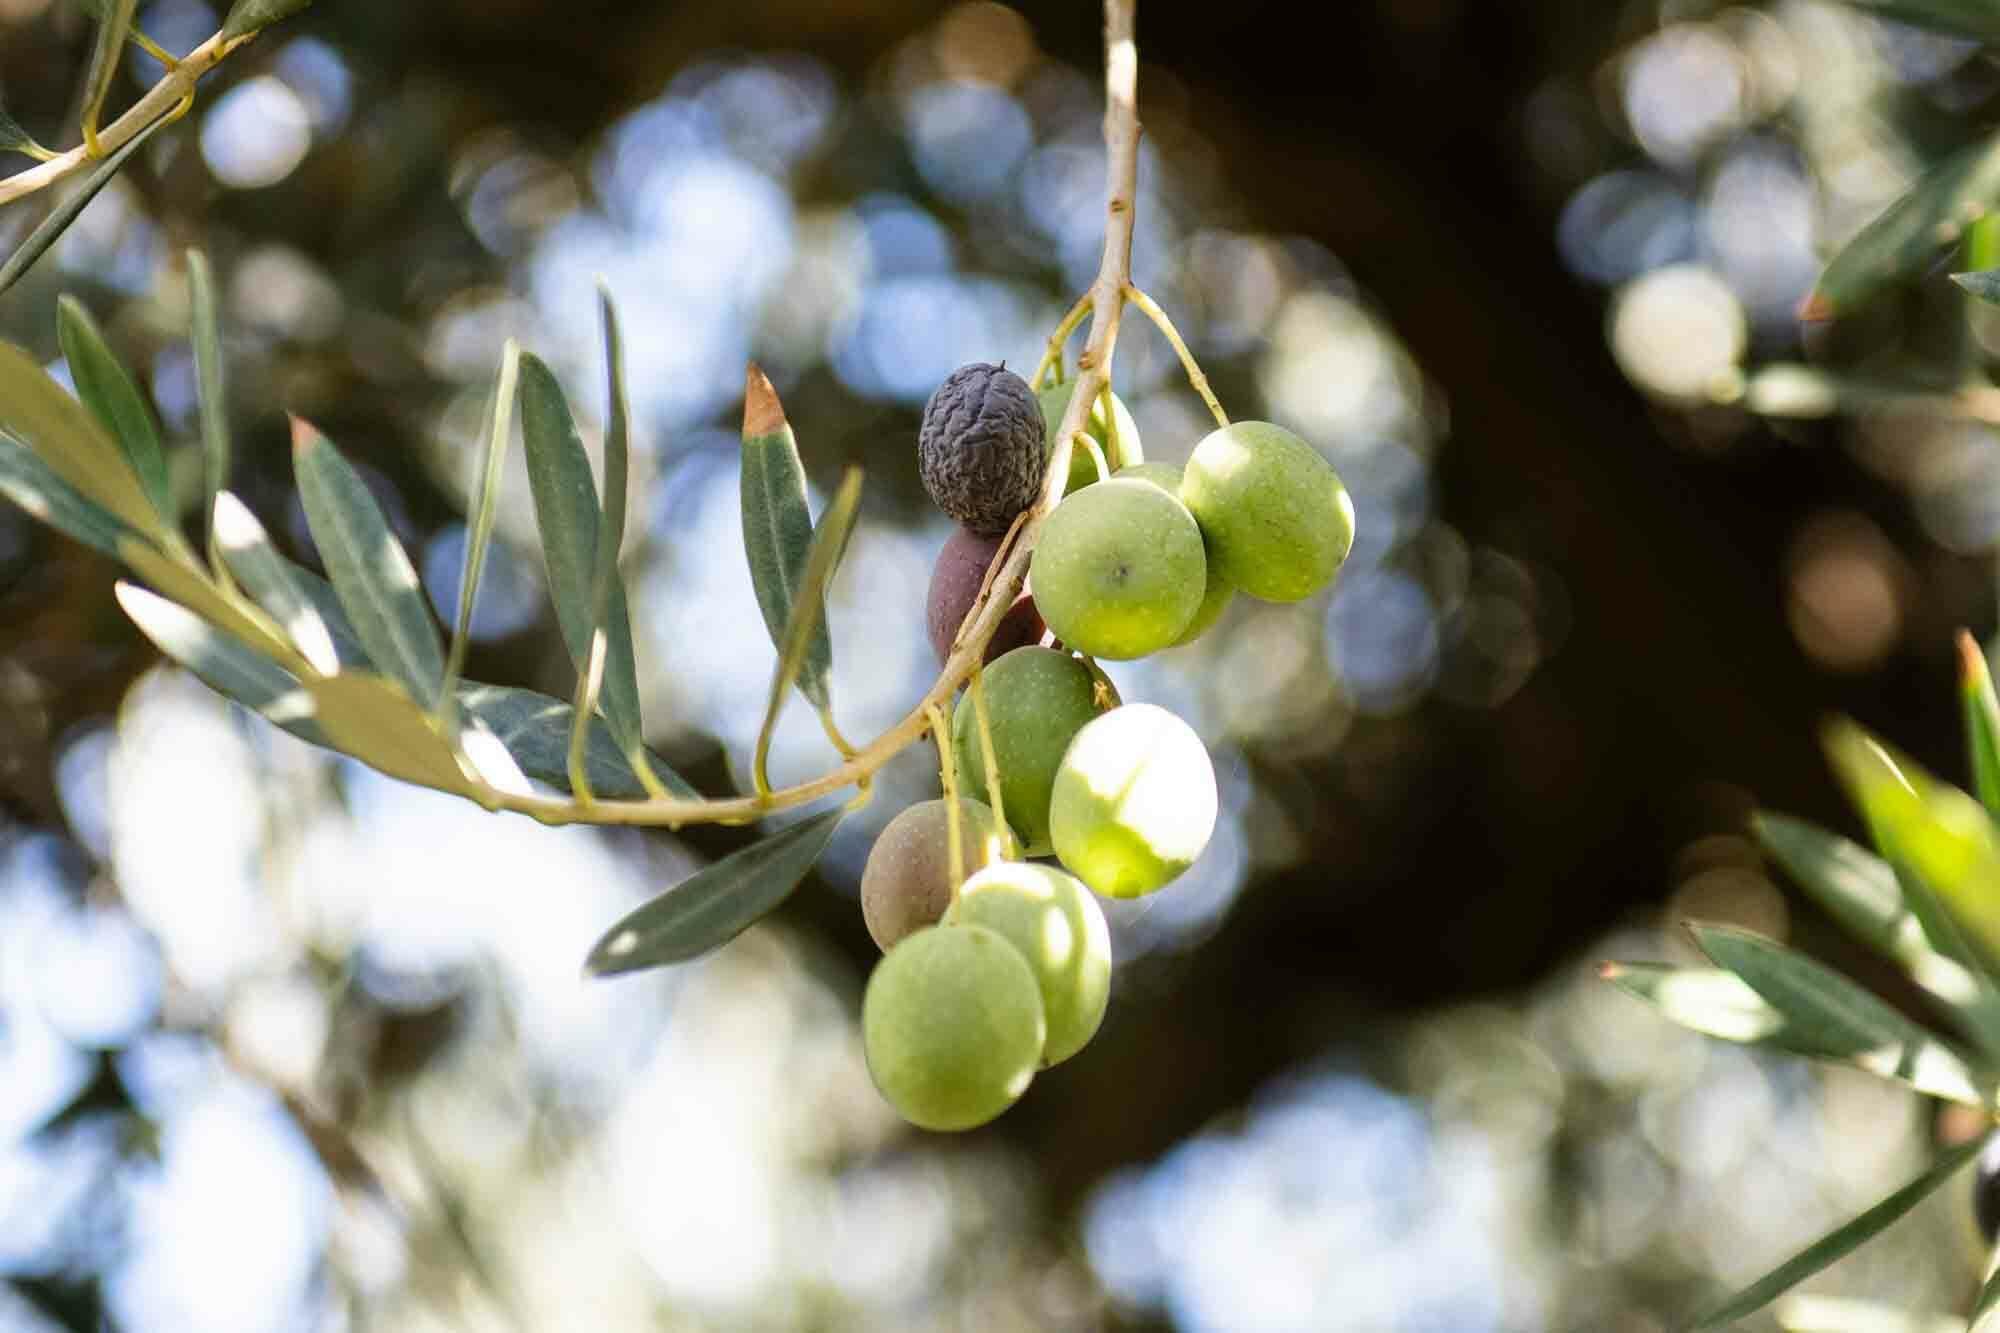 California ripe olives on the tree